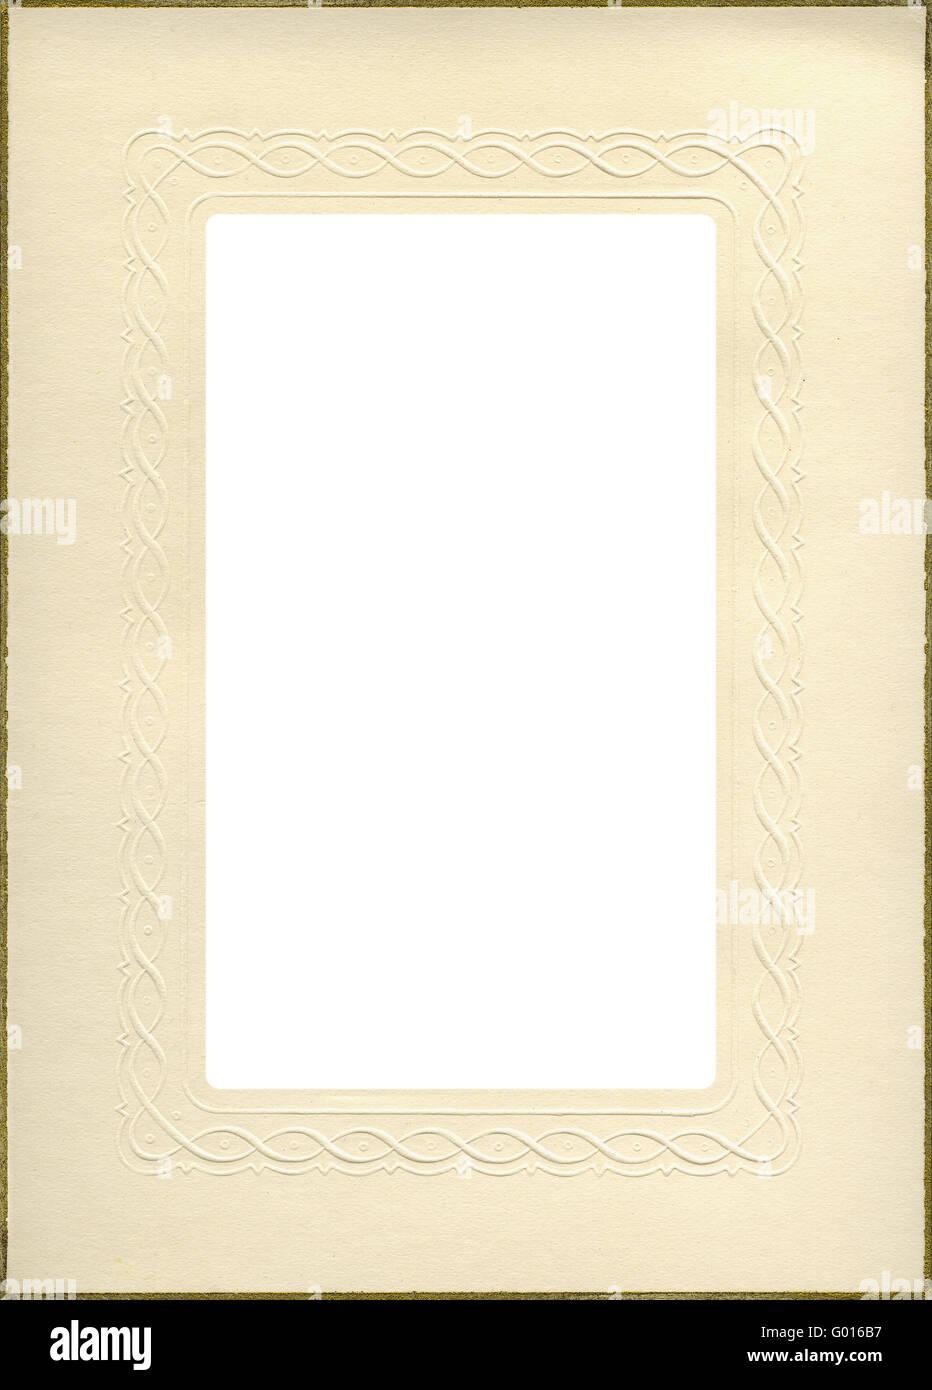 Vintage-Papier Rahmen Stockfoto, Bild: 103289179 - Alamy